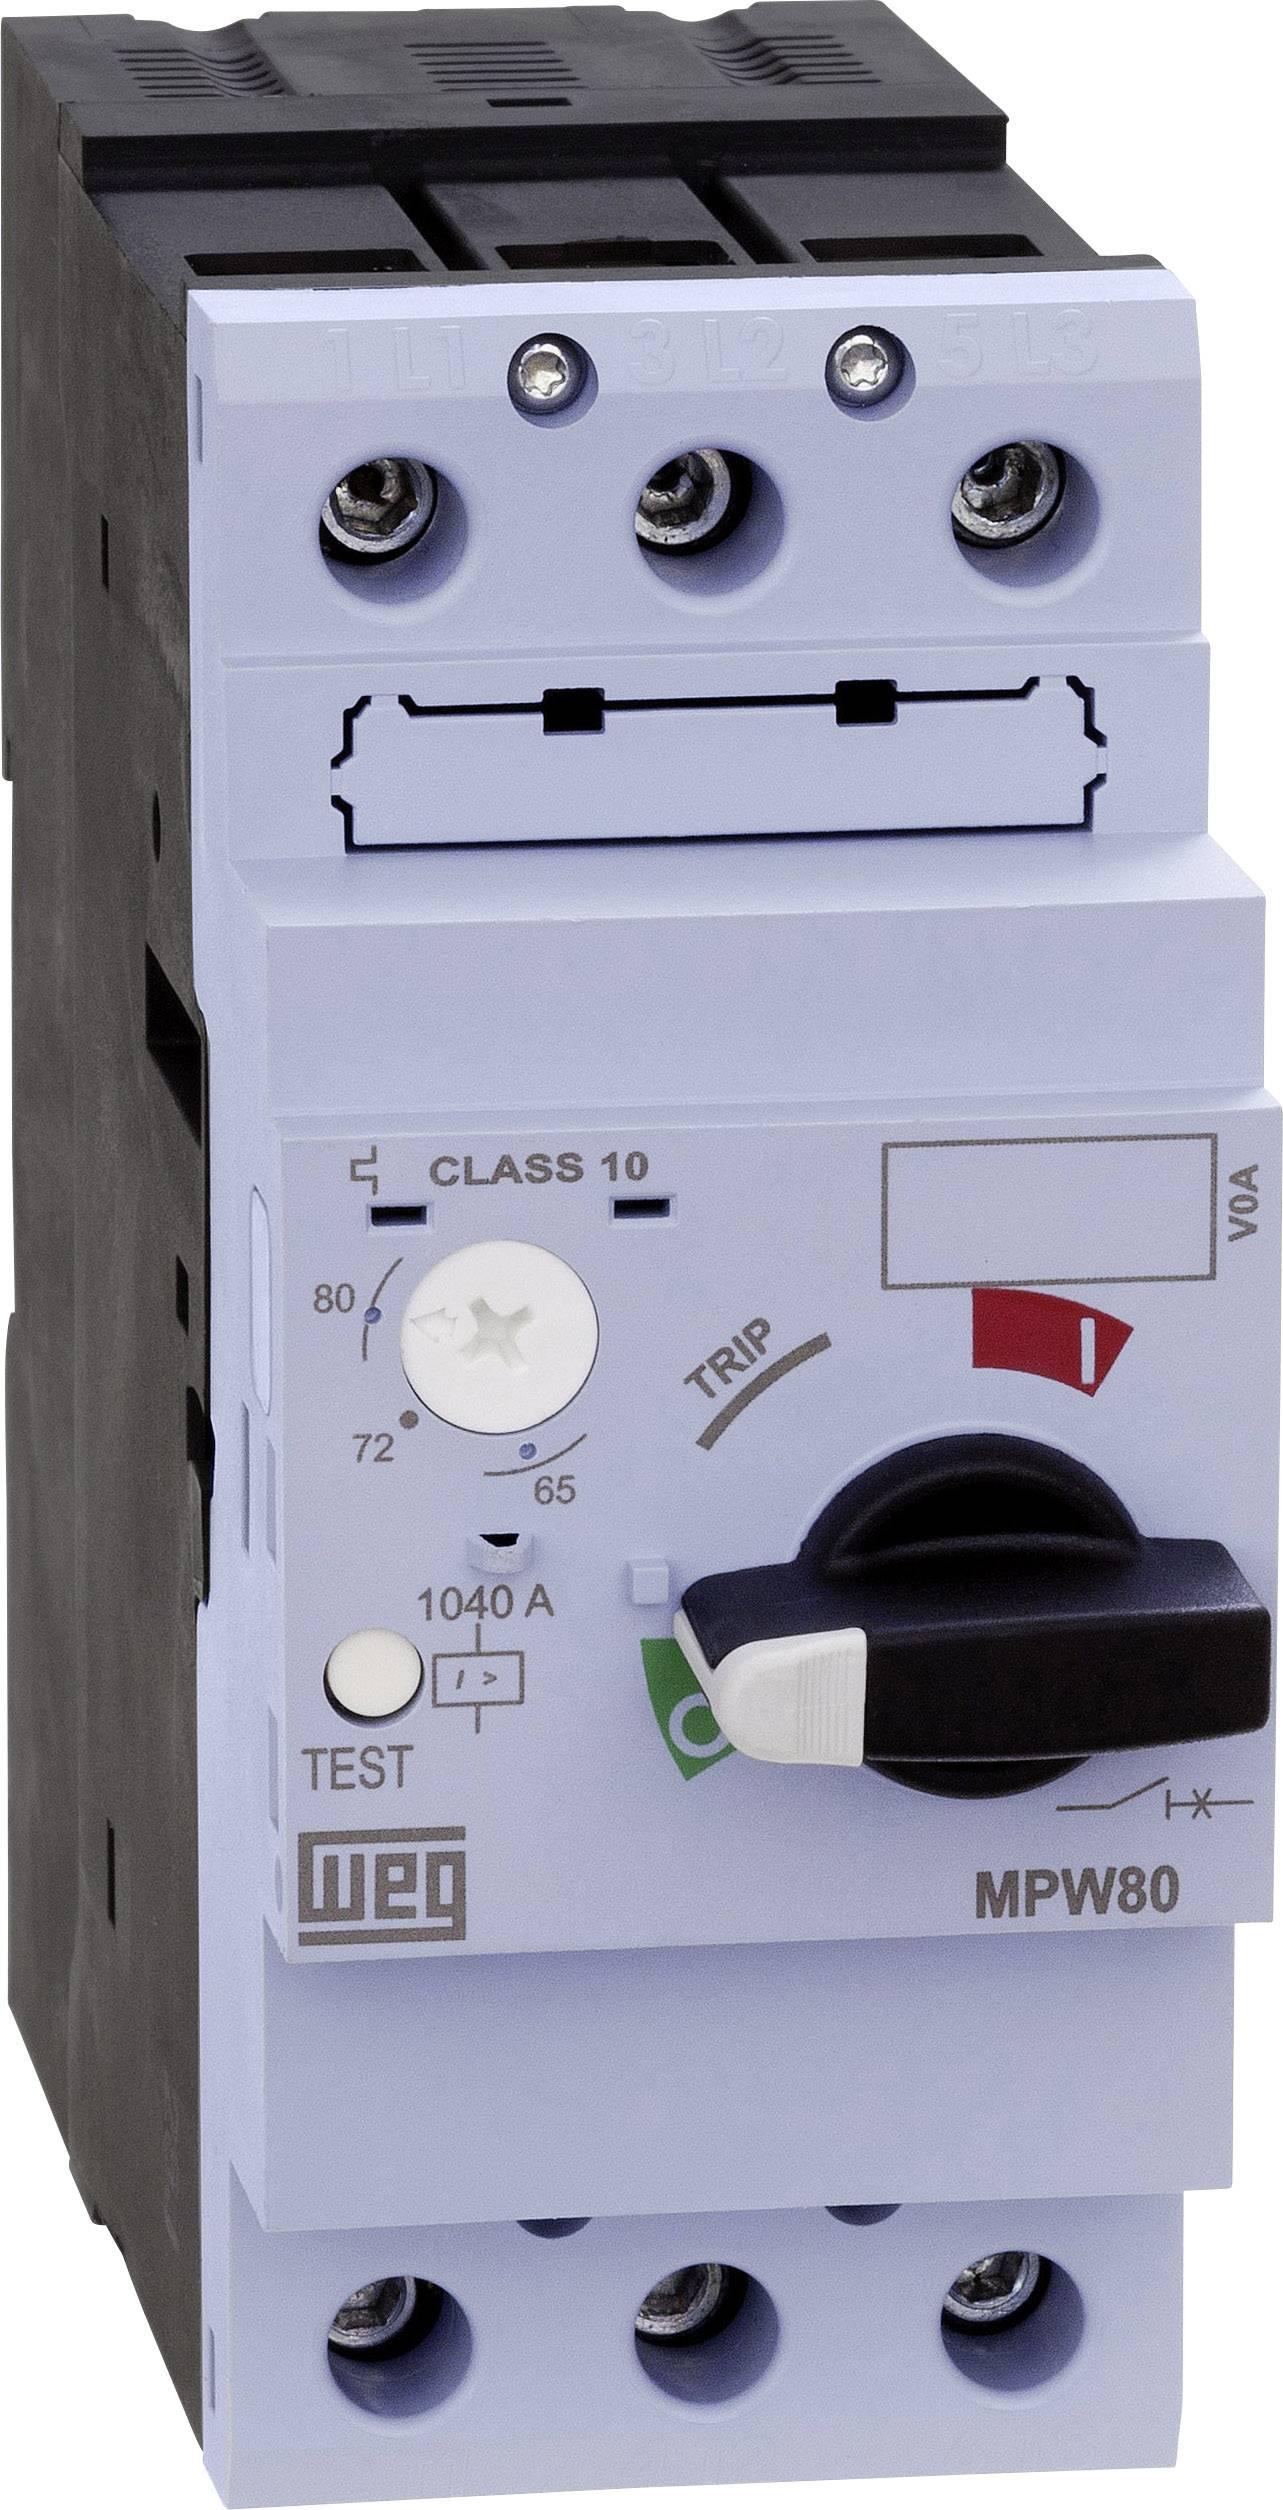 Ochranný spínač motora WEG MPW80-3-U050, nastaviteľné, 50 A, IP20, 1 ks